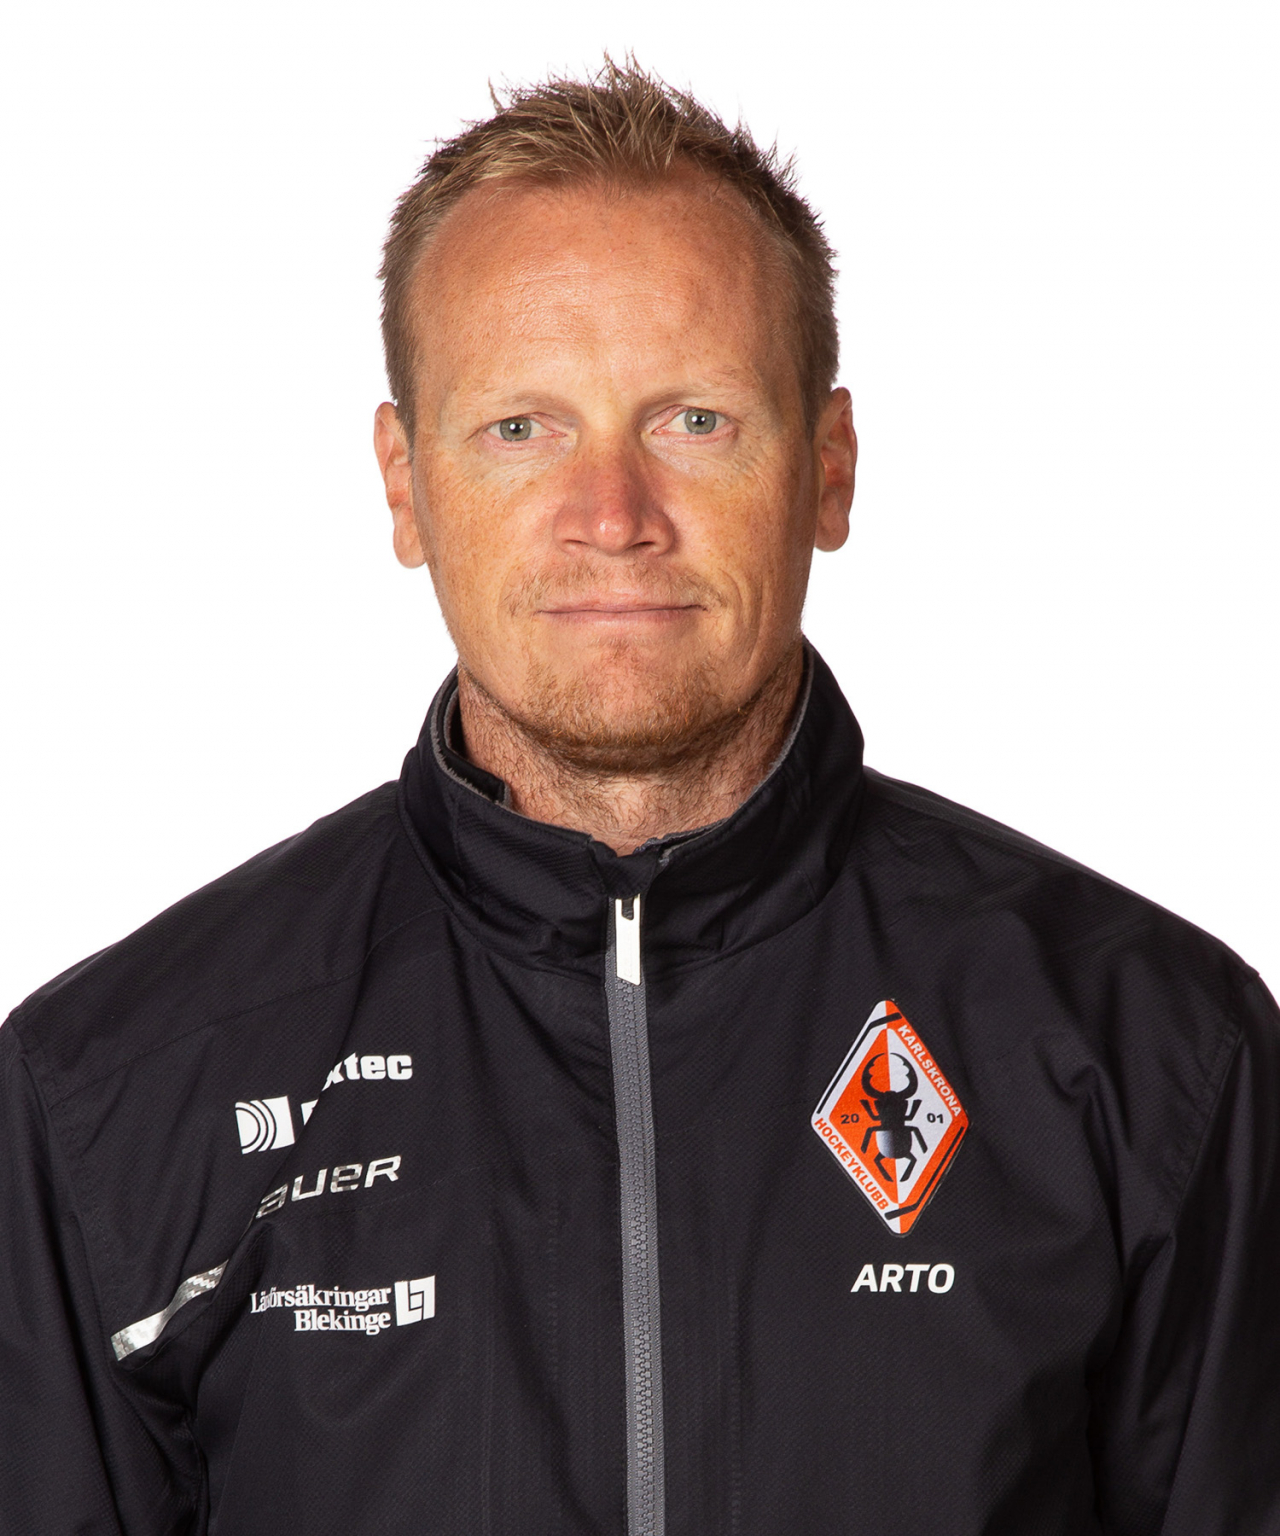 Arto Miettinen